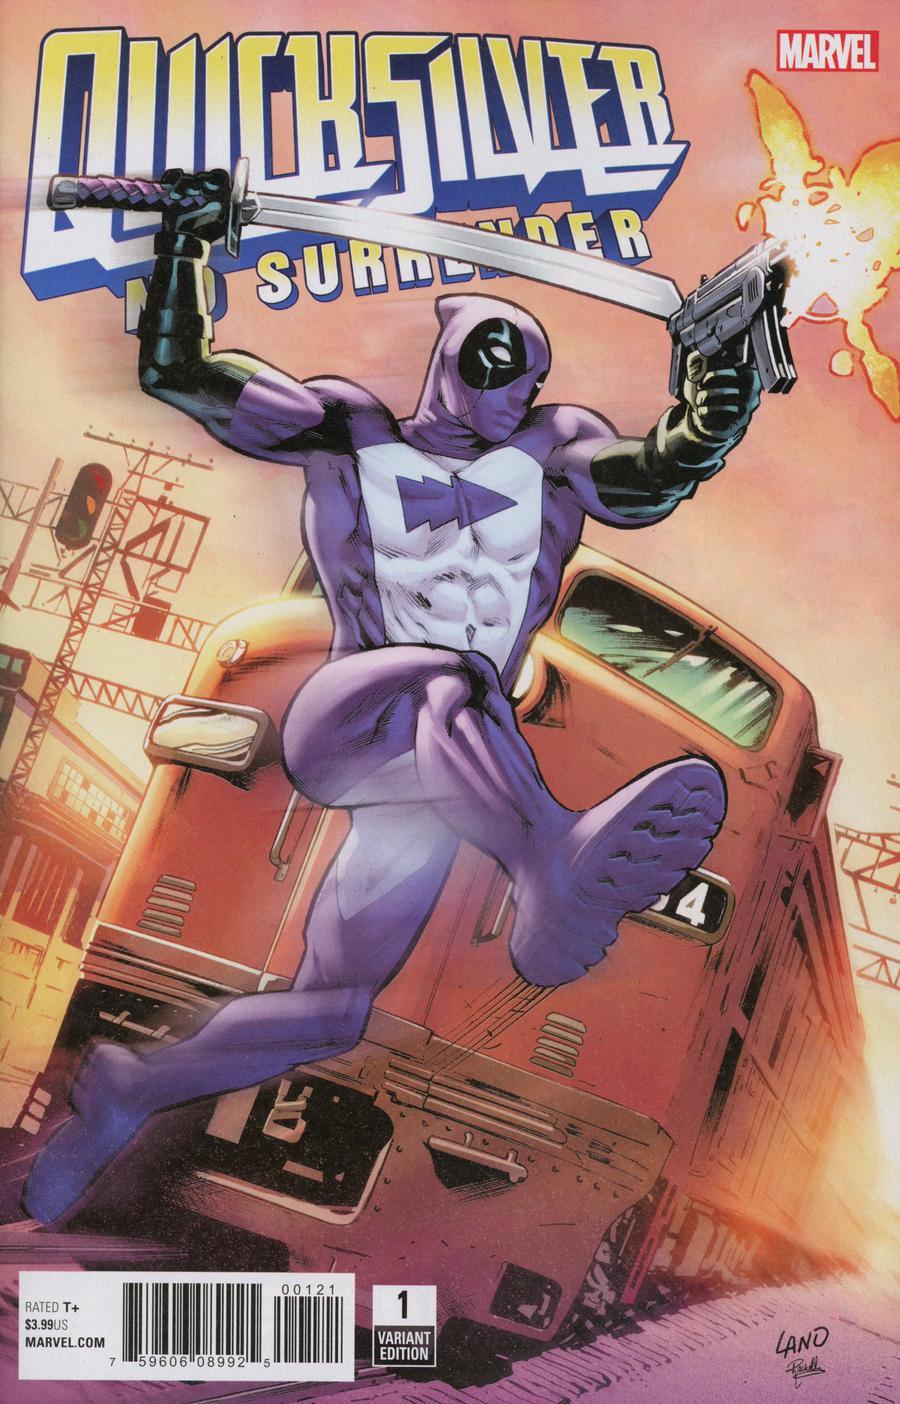 Quicksilver No Surrender #1 Cover B Variant Greg Land Deadpool Cover